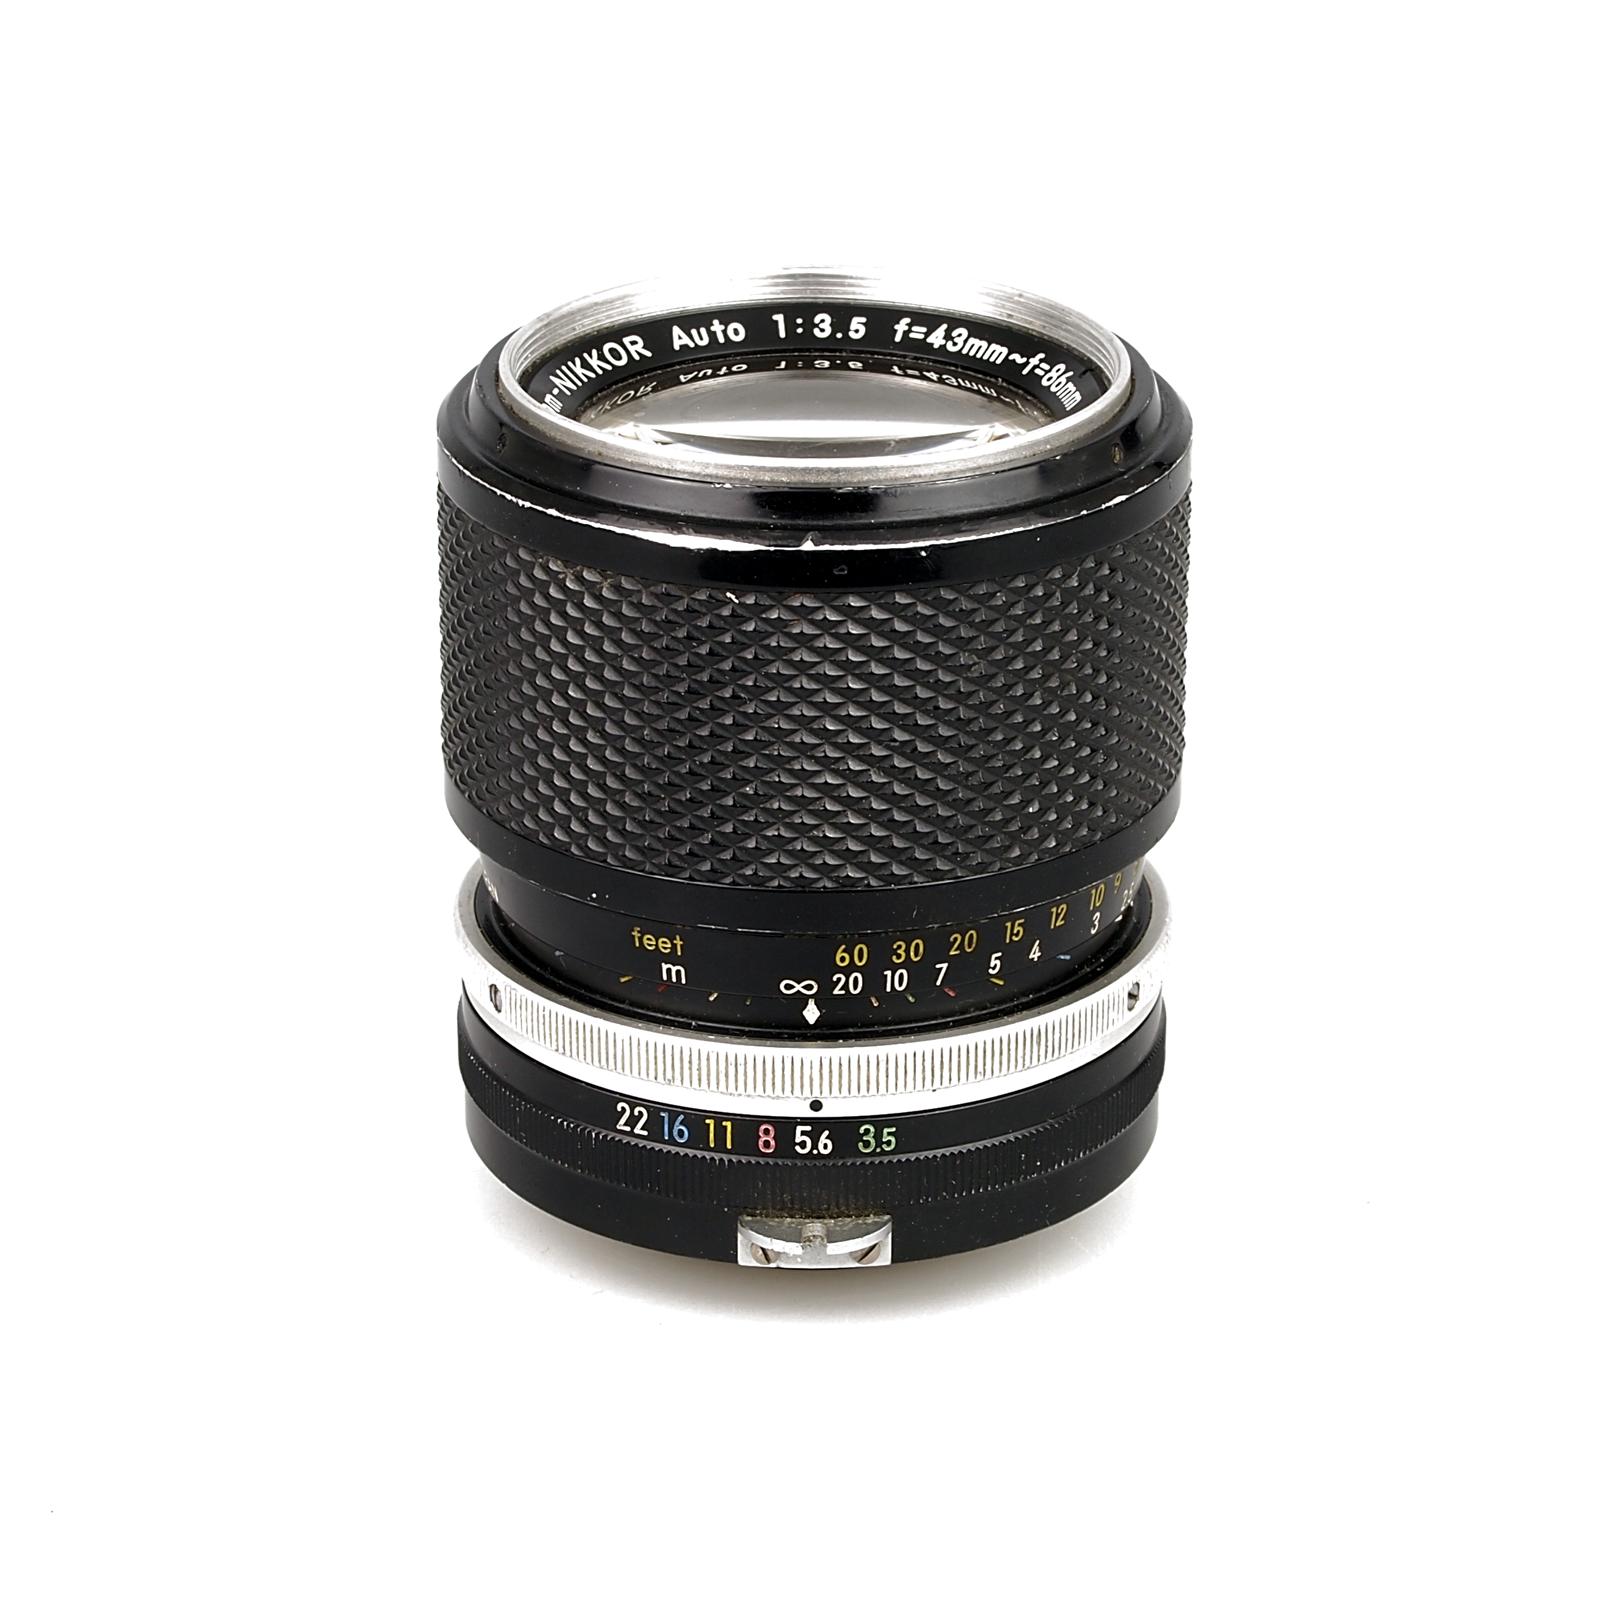 Zoom Nikkor Auto 43-86 f/3.5